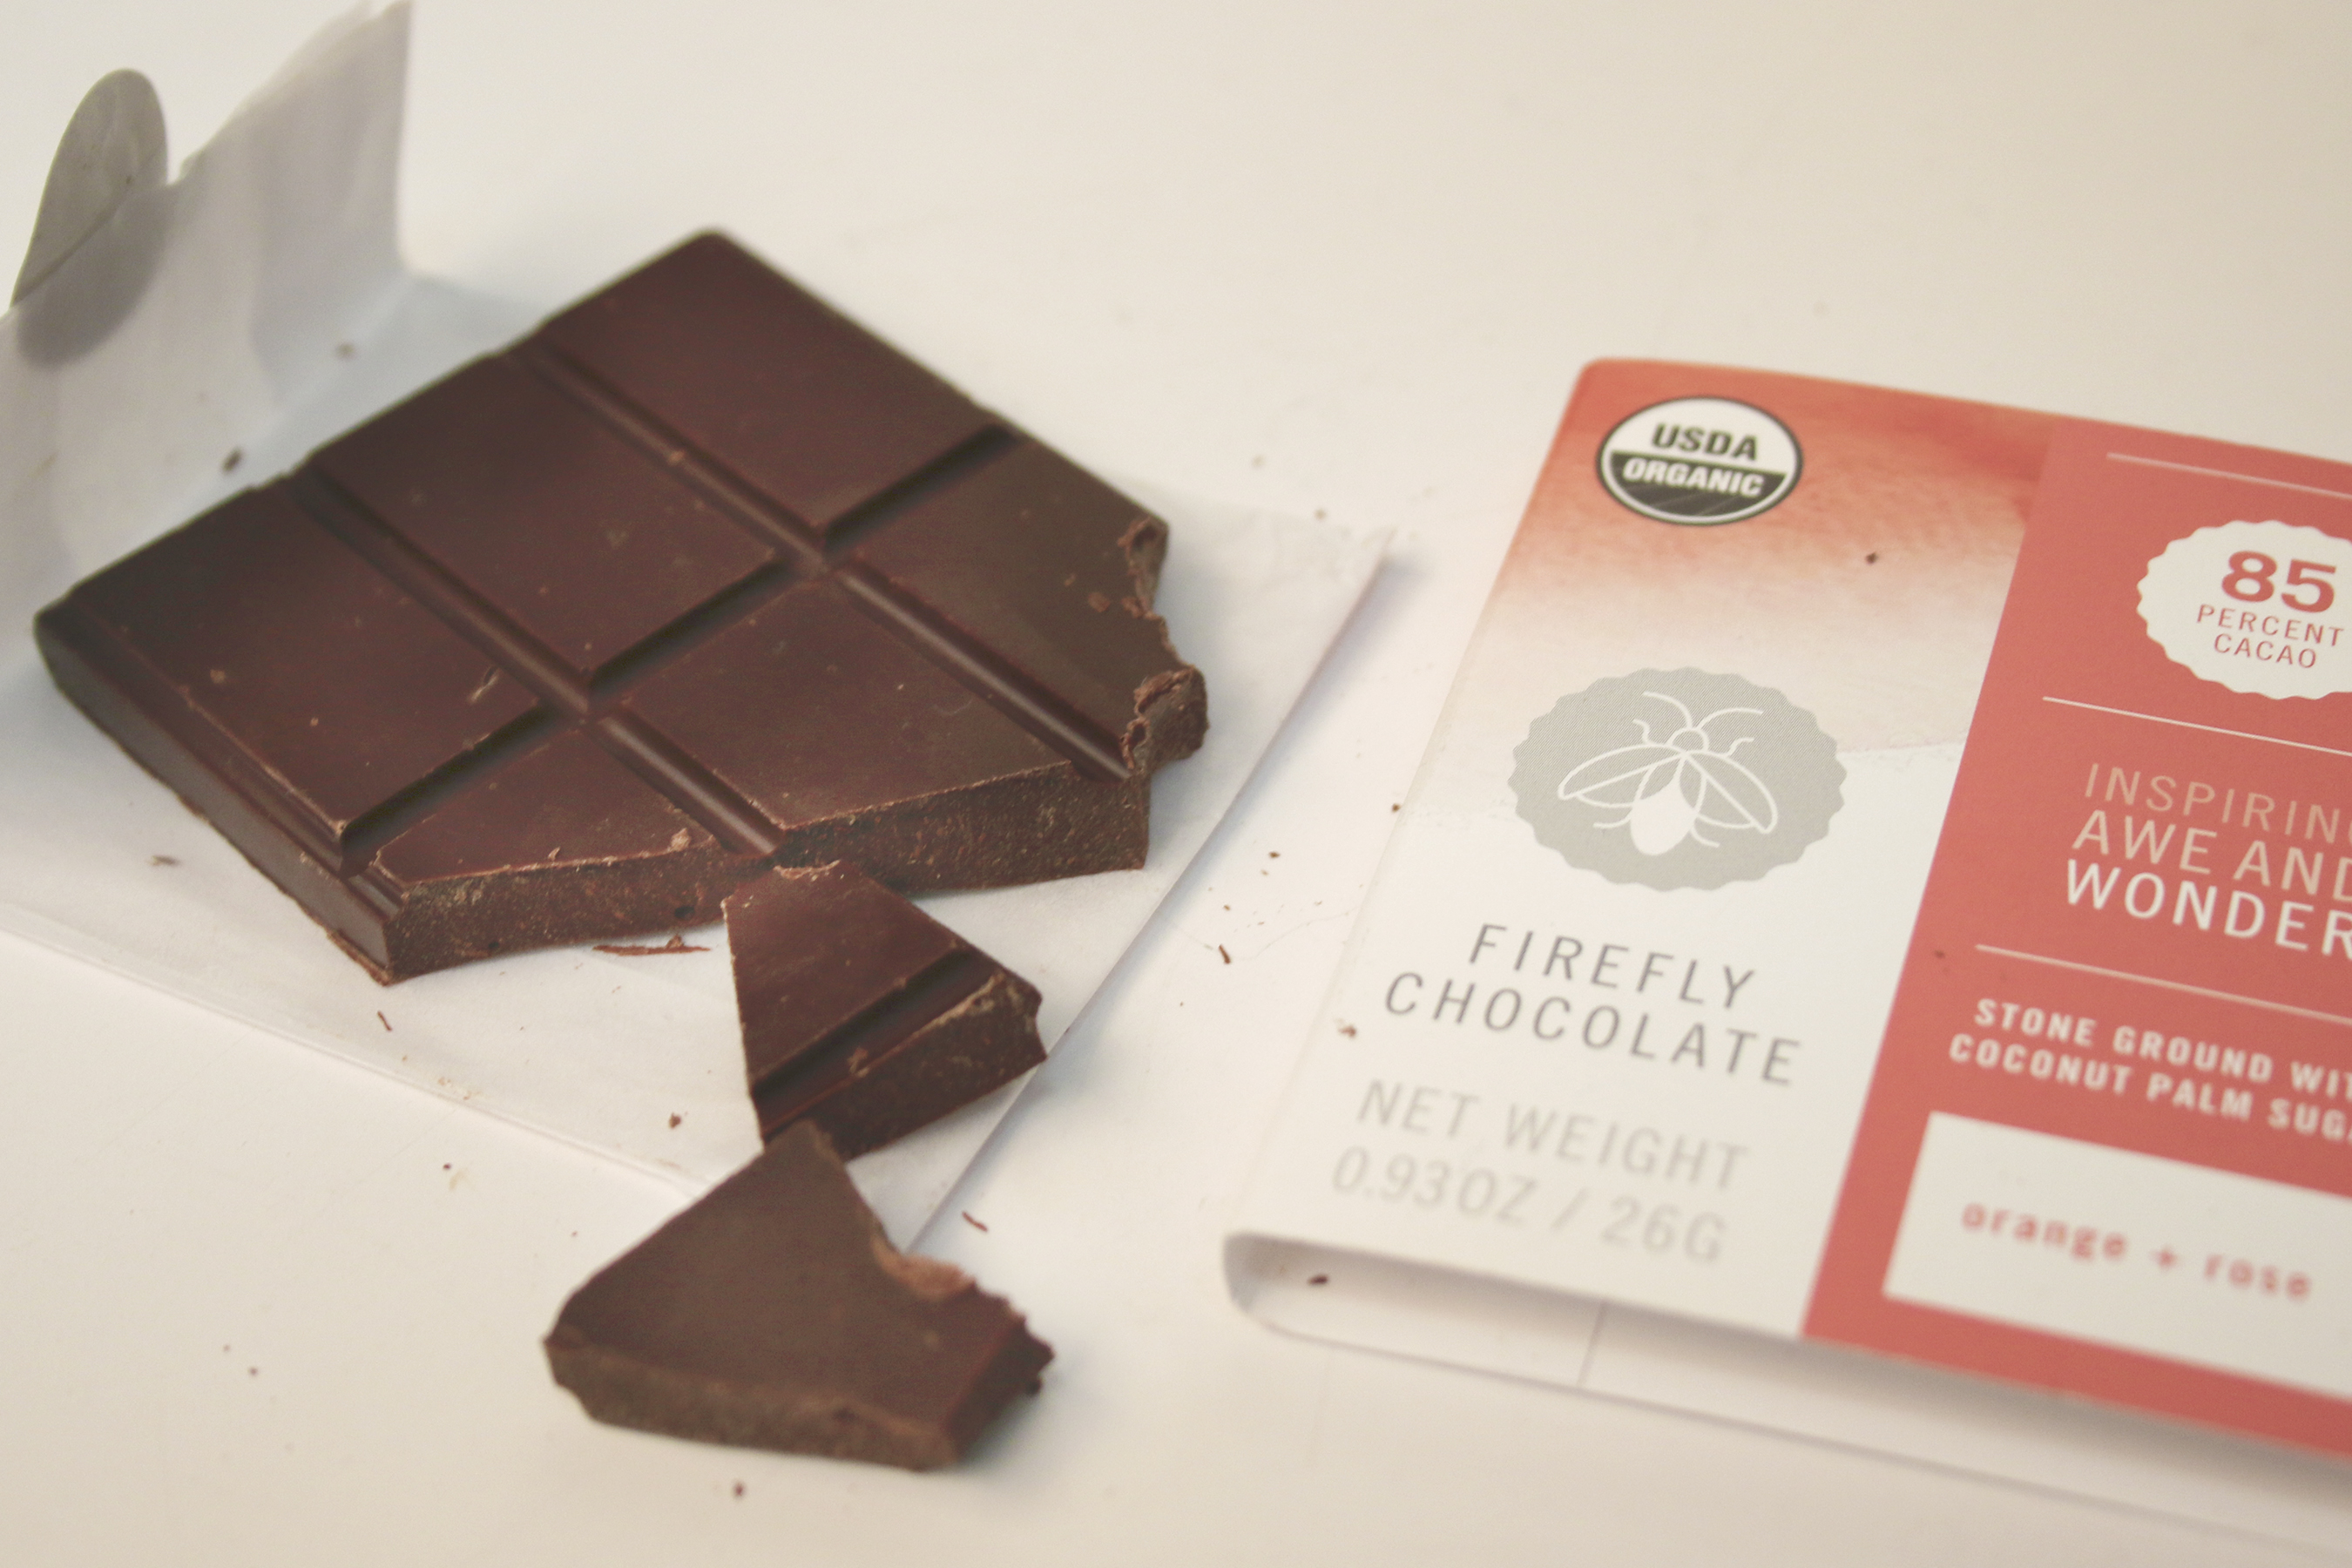 Supermarket Spy: Firefly Chocolate with Orange and Rose